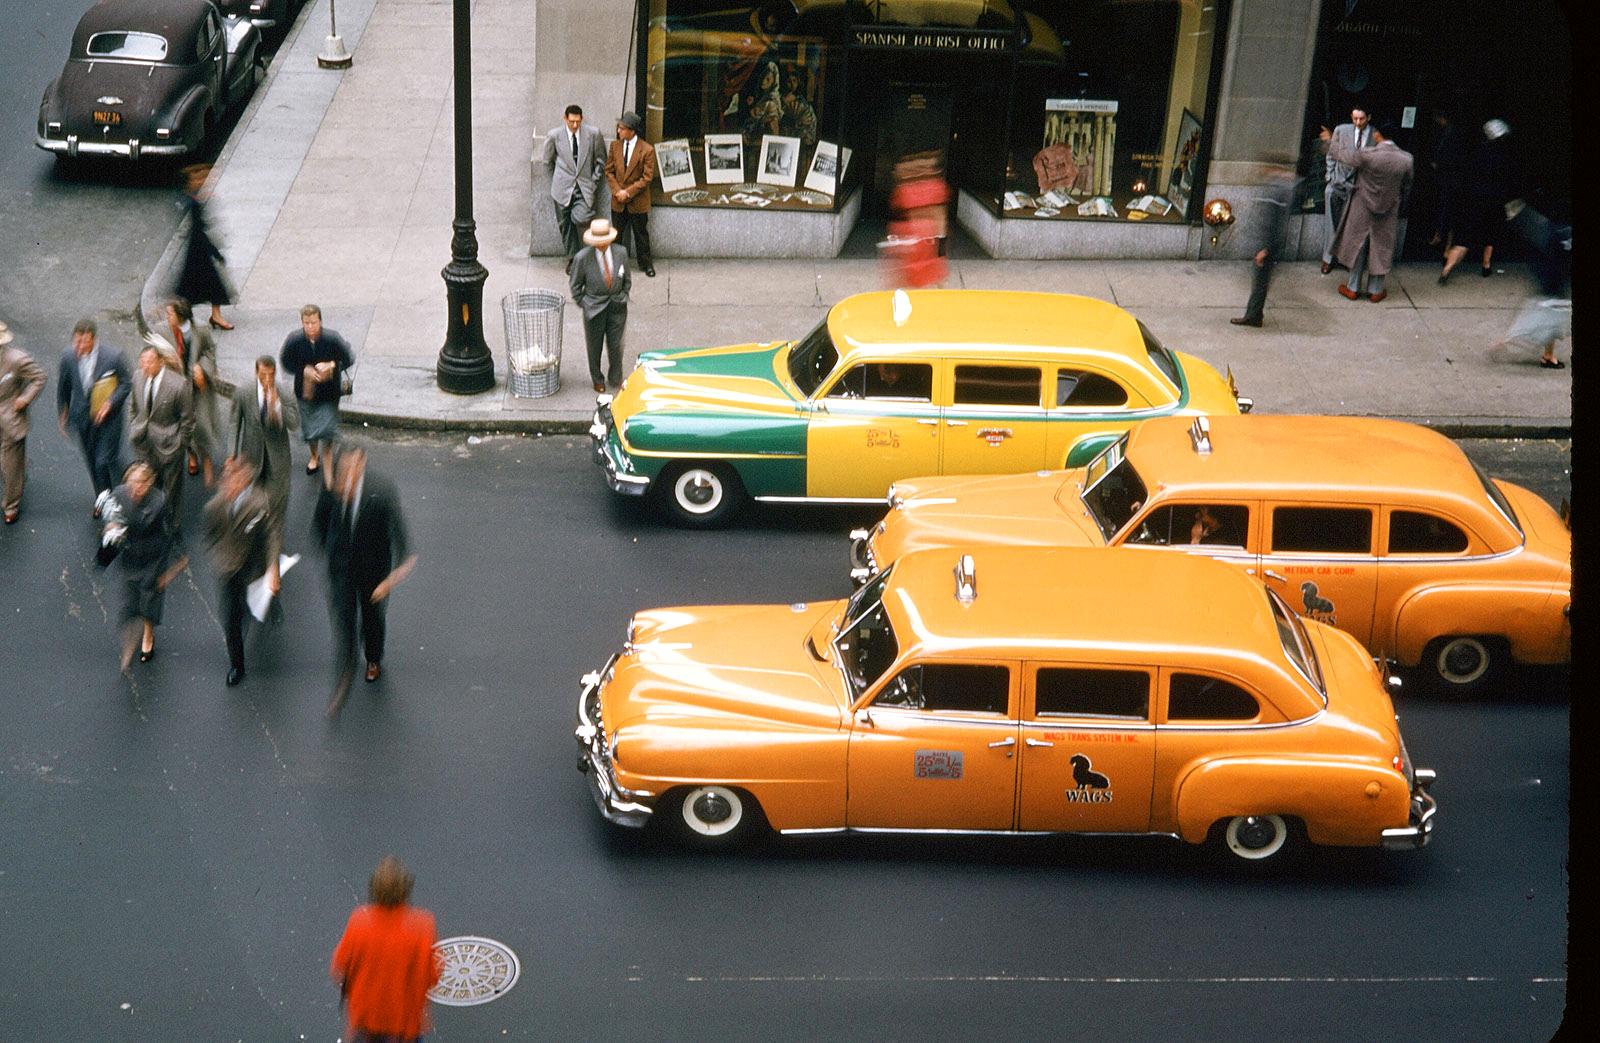 Dan-Wynn_Vintage-Cars-New-York_5-1-53_0005.jpg